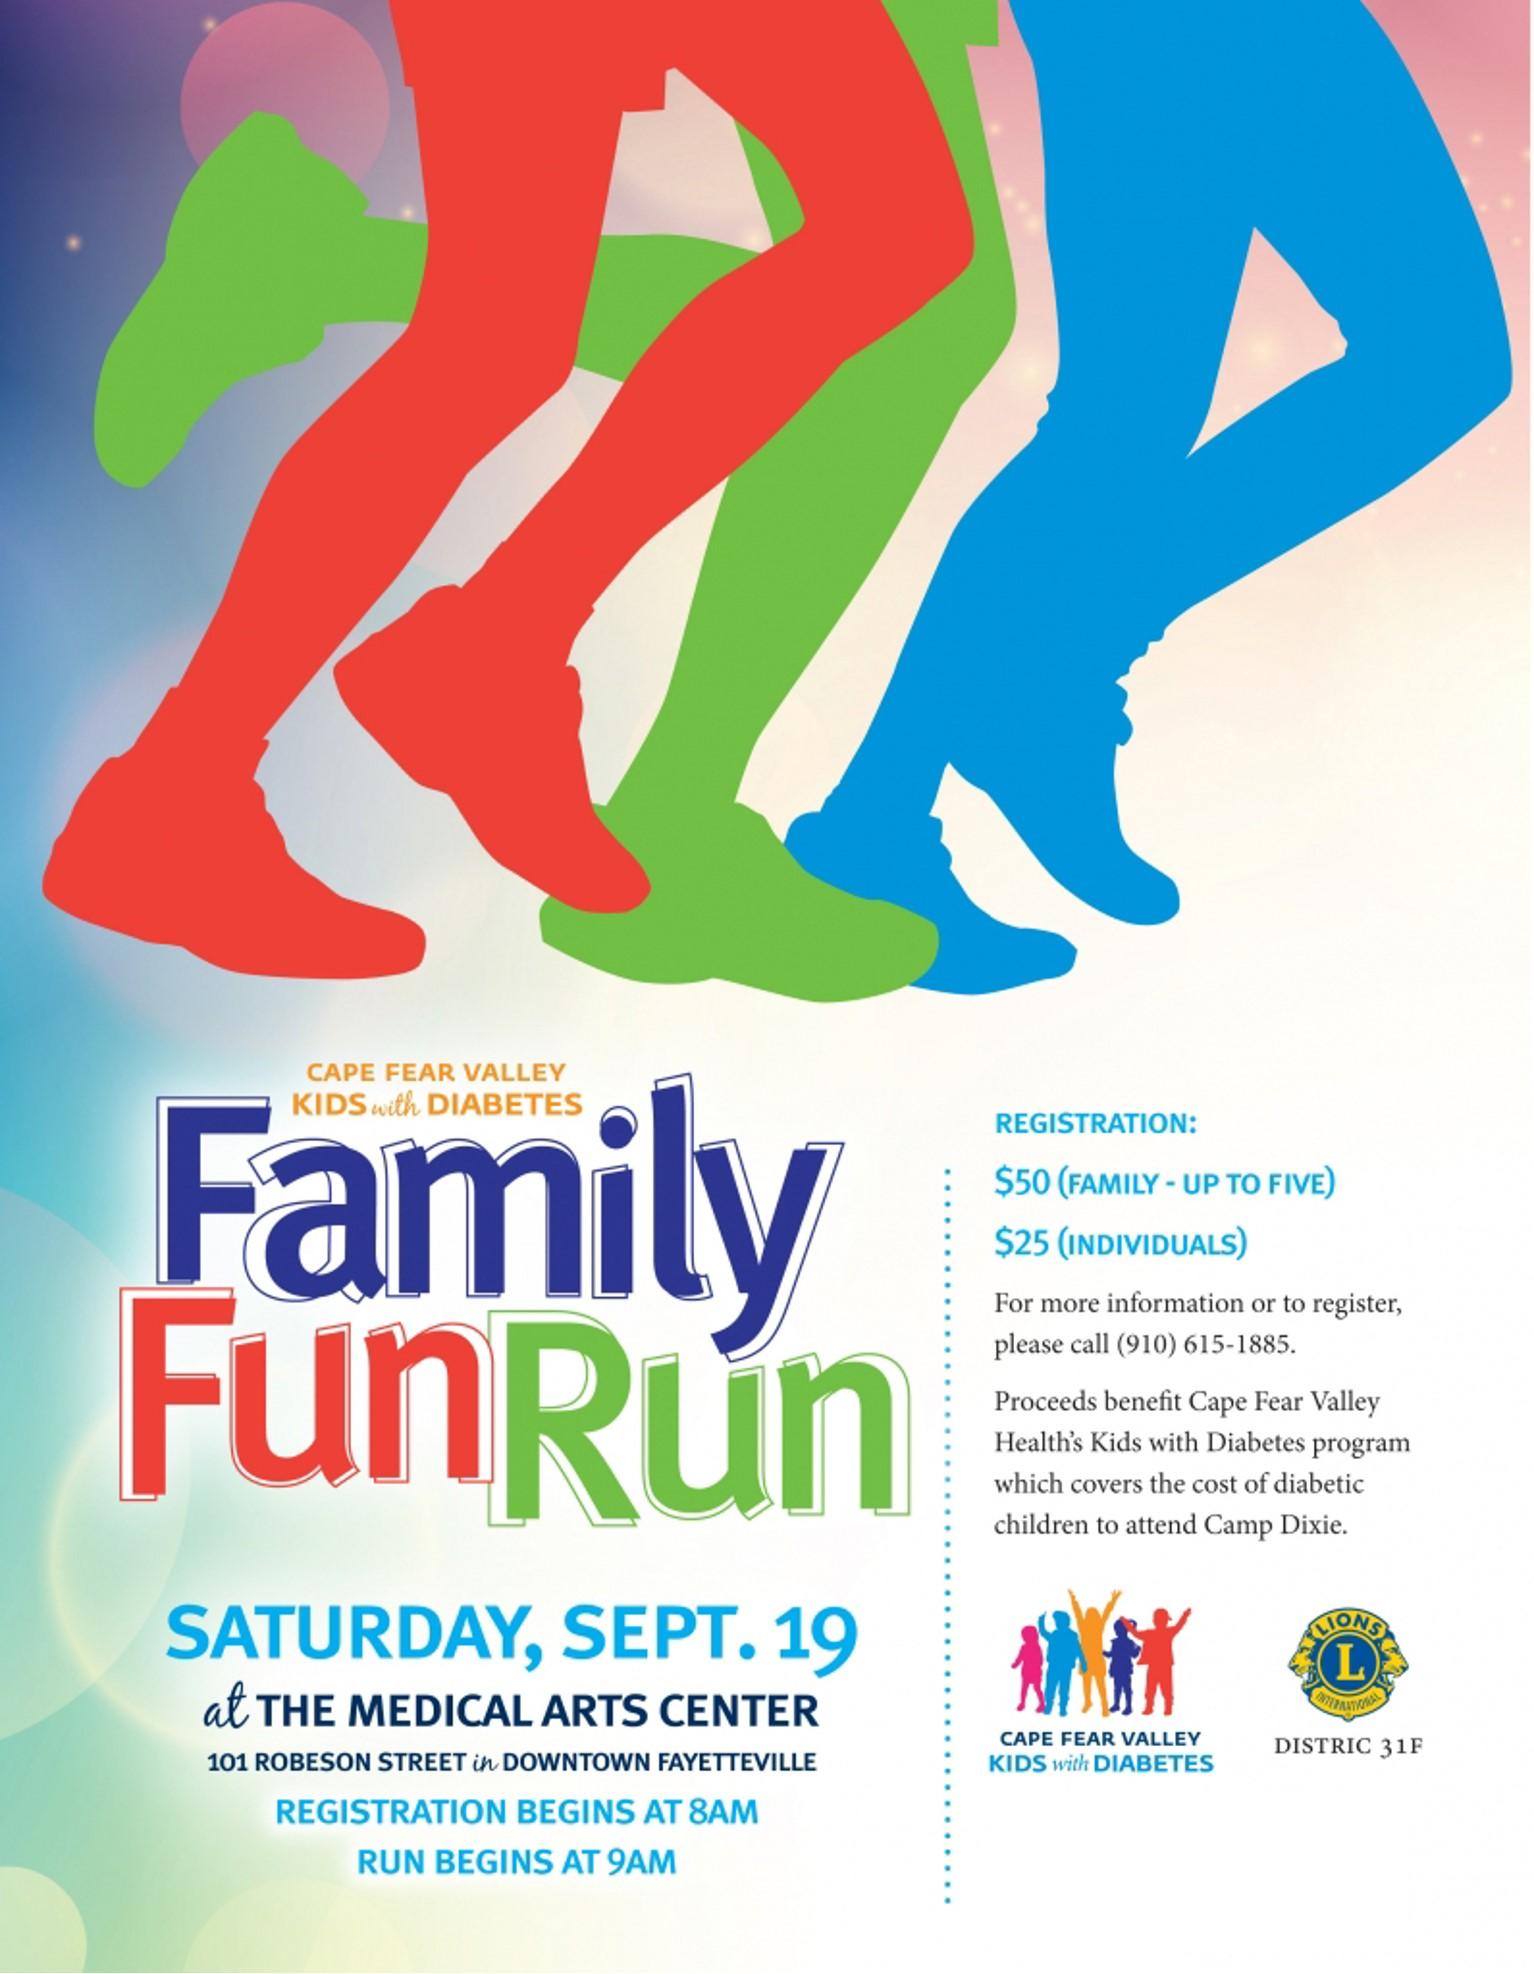 Unit F3: Family Fun Run -